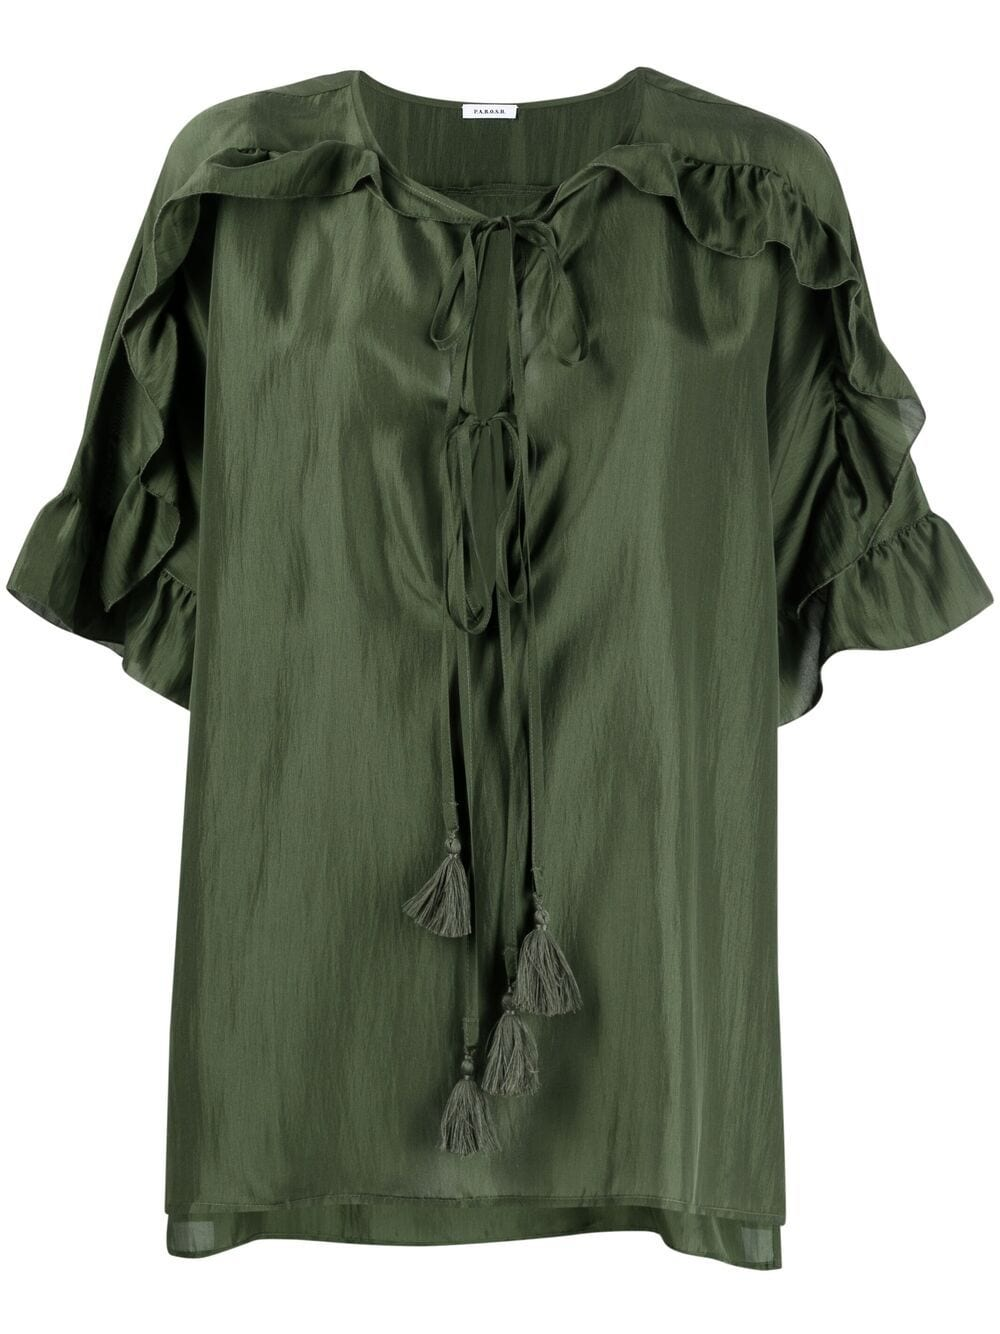 Blusa in seta Shatay in seta verde oliva  P.A.R.O.S.H. |  | D312241-SHATAY007